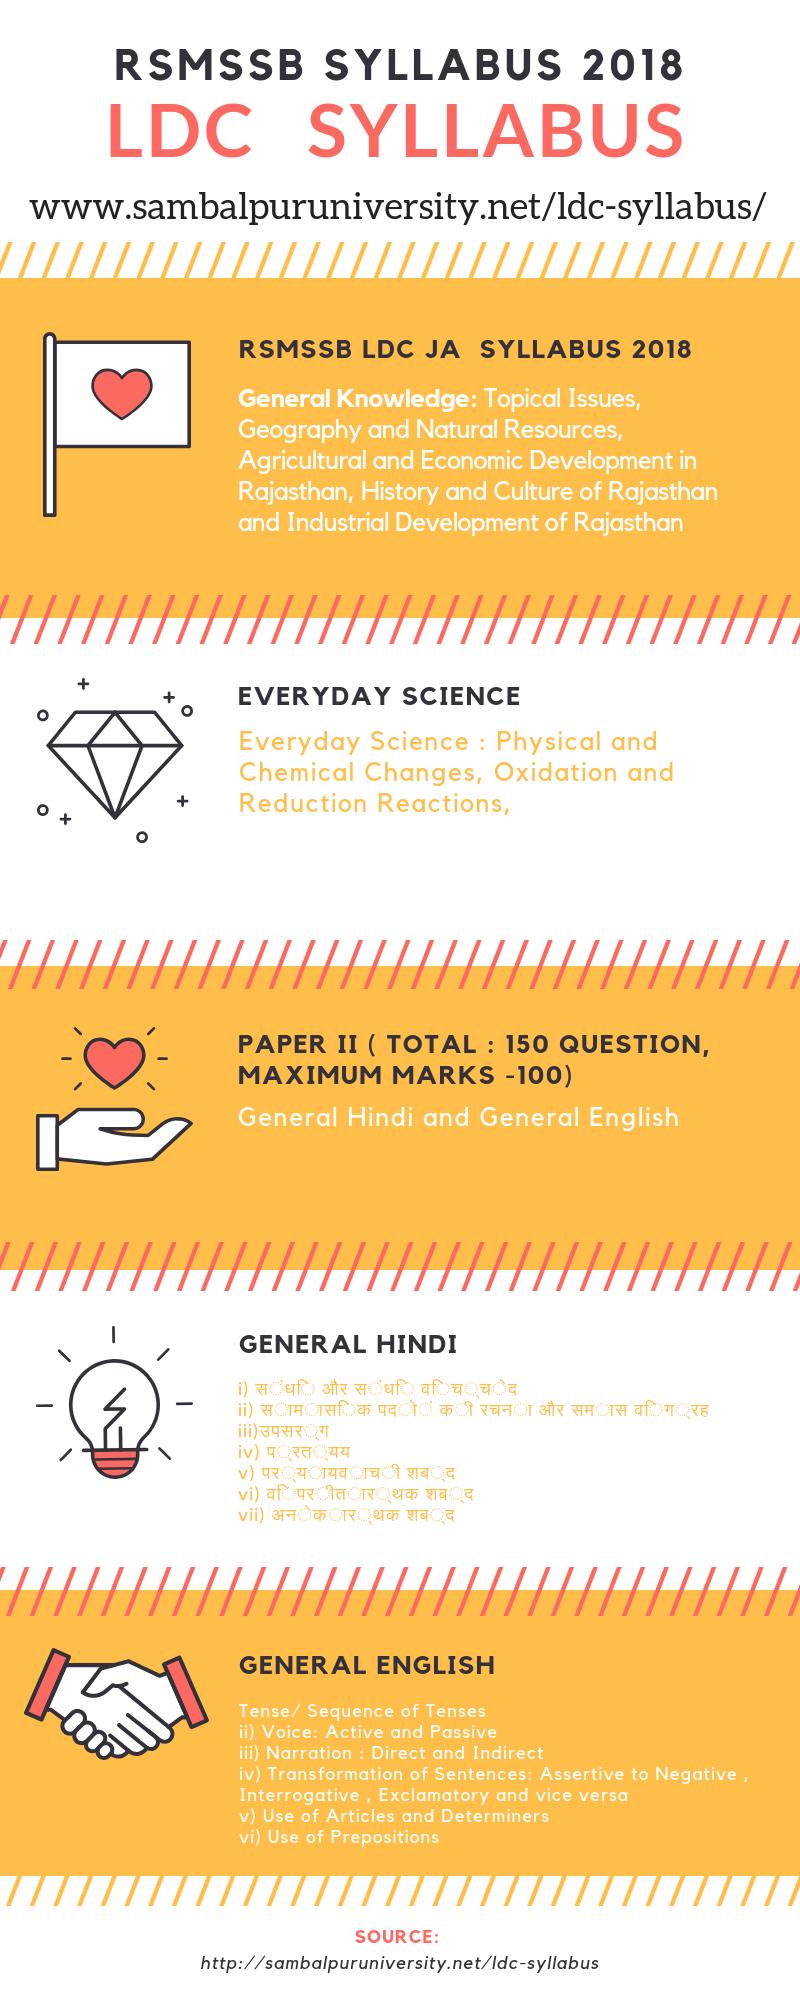 LDC Syllabus Infographic